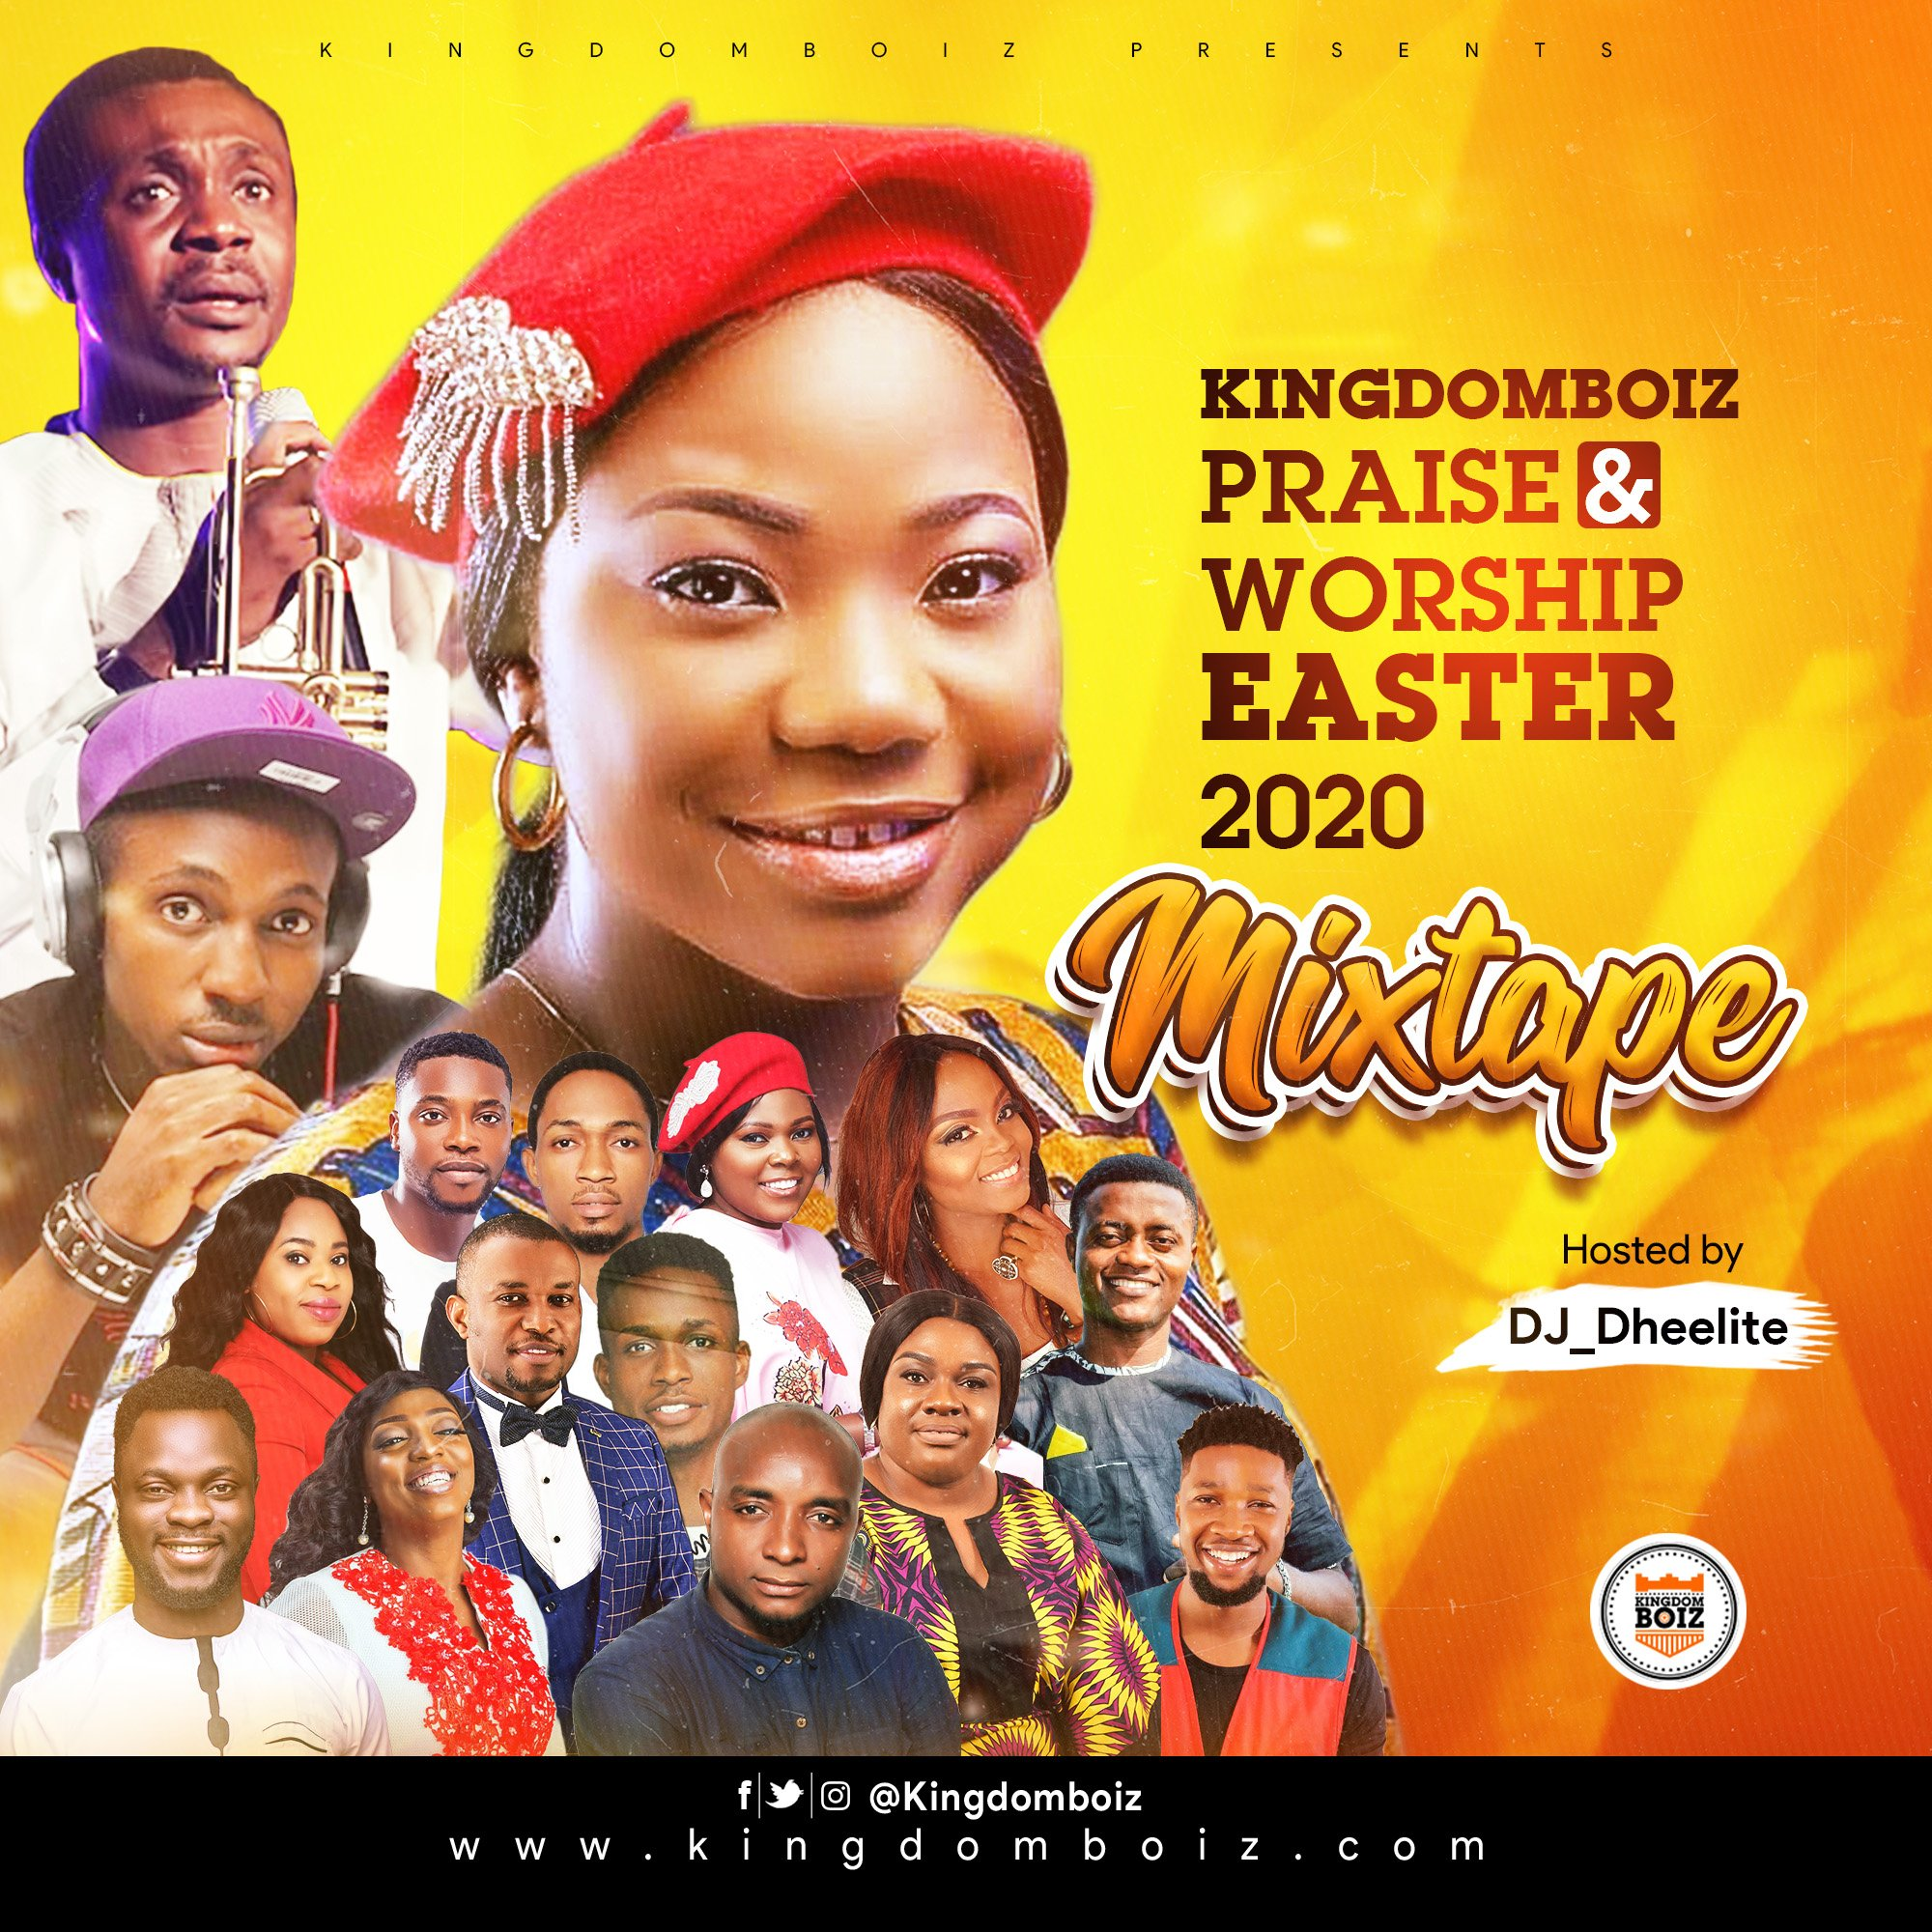 Kingdomboiz Praise & Worship Easter 2020 Mixtape